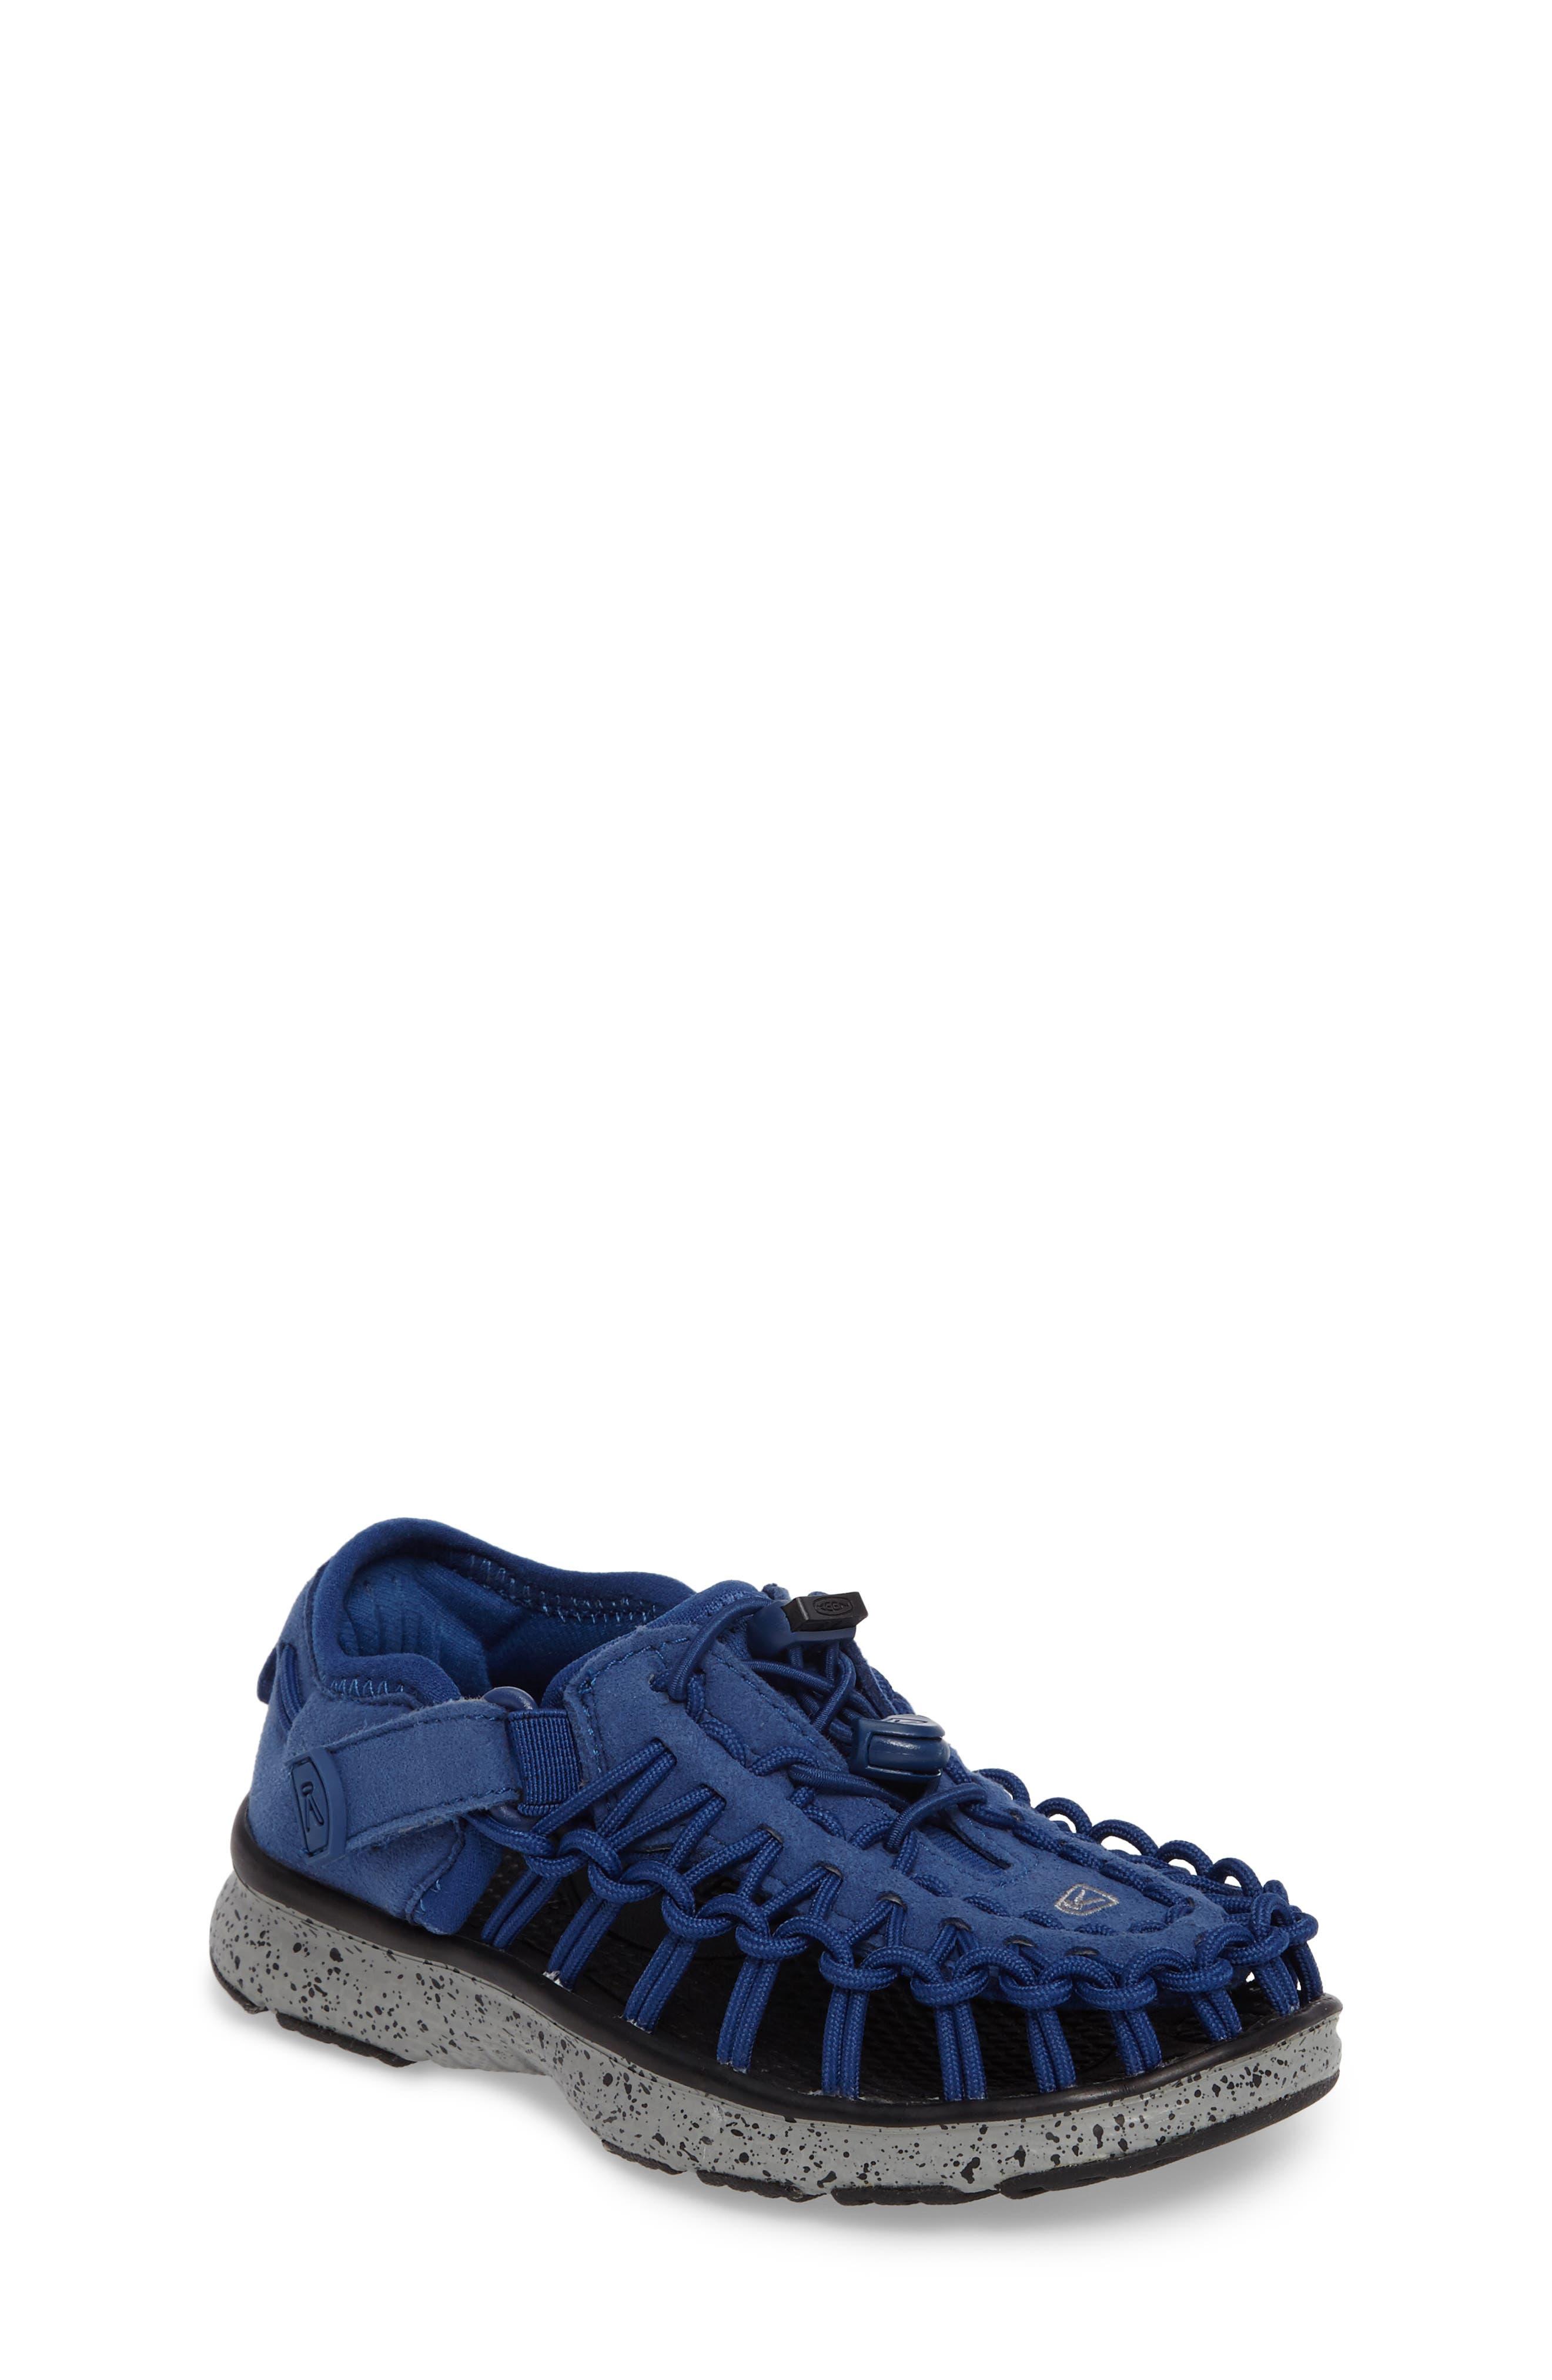 'Uneek' Water Sneaker,                             Main thumbnail 1, color,                             Blue/ Neutral Grey